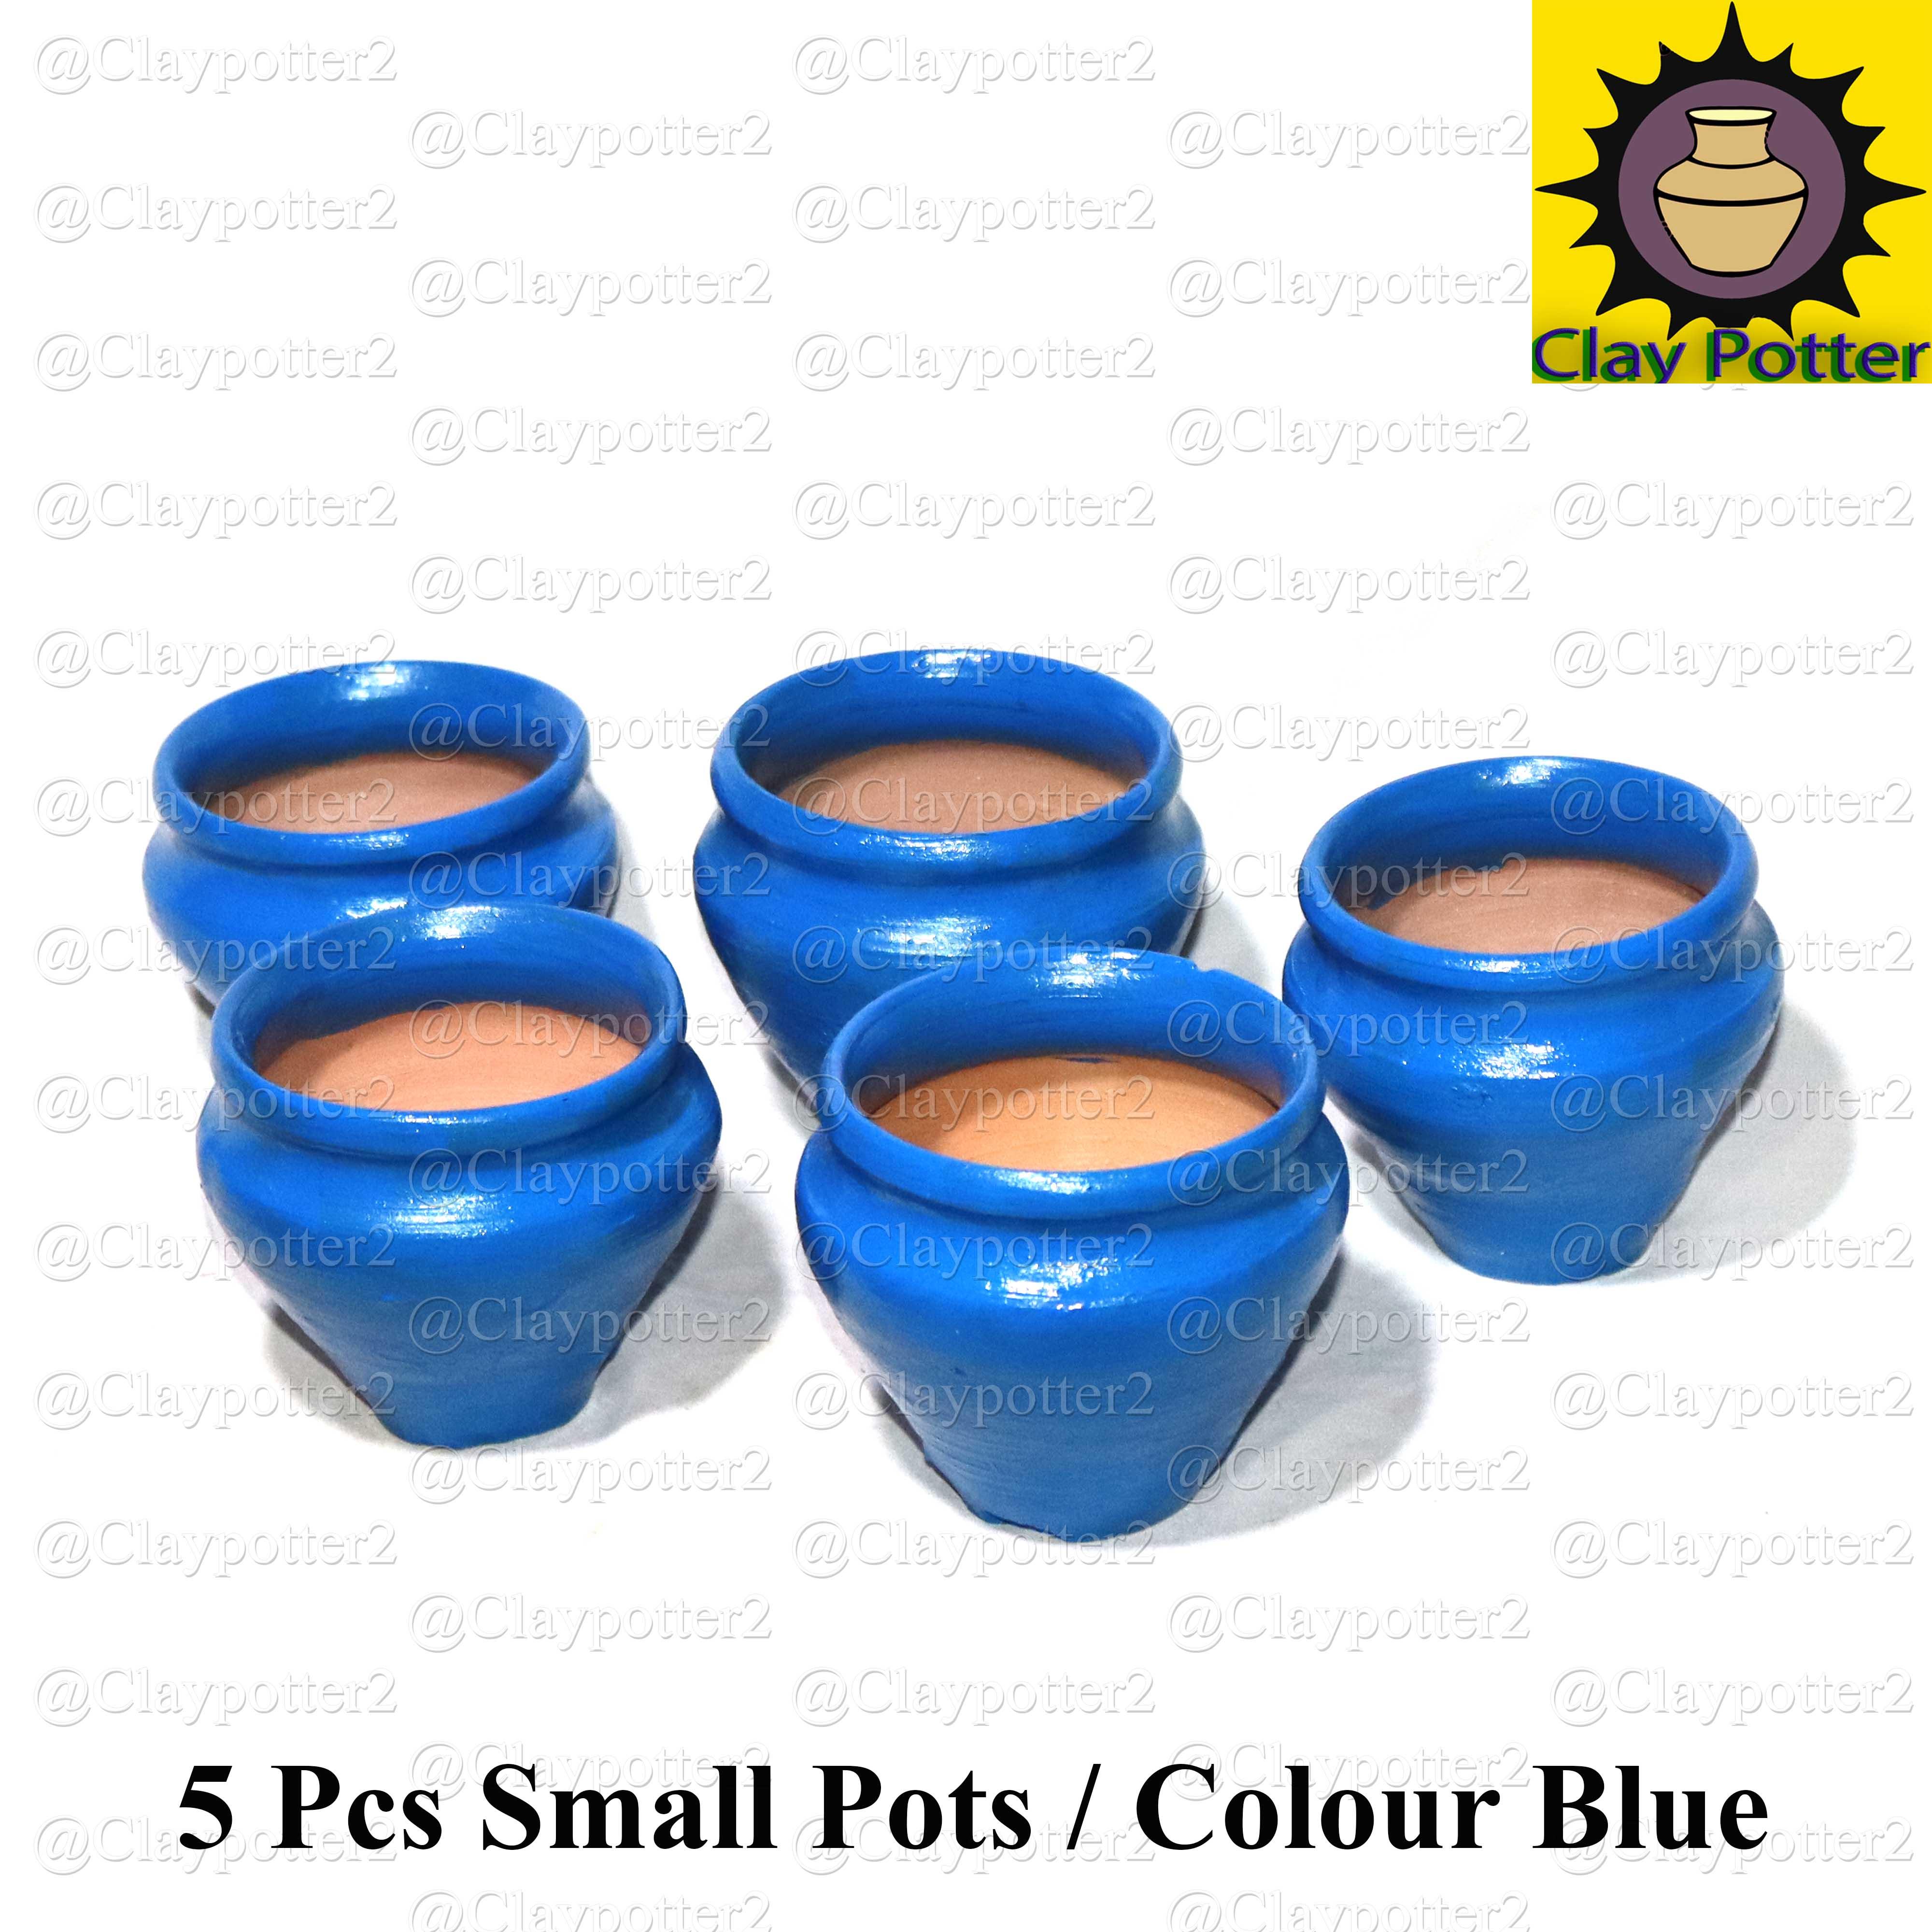 Small Pots 5 Pcs | Flower Pot | Seeding Pot | Home Decor